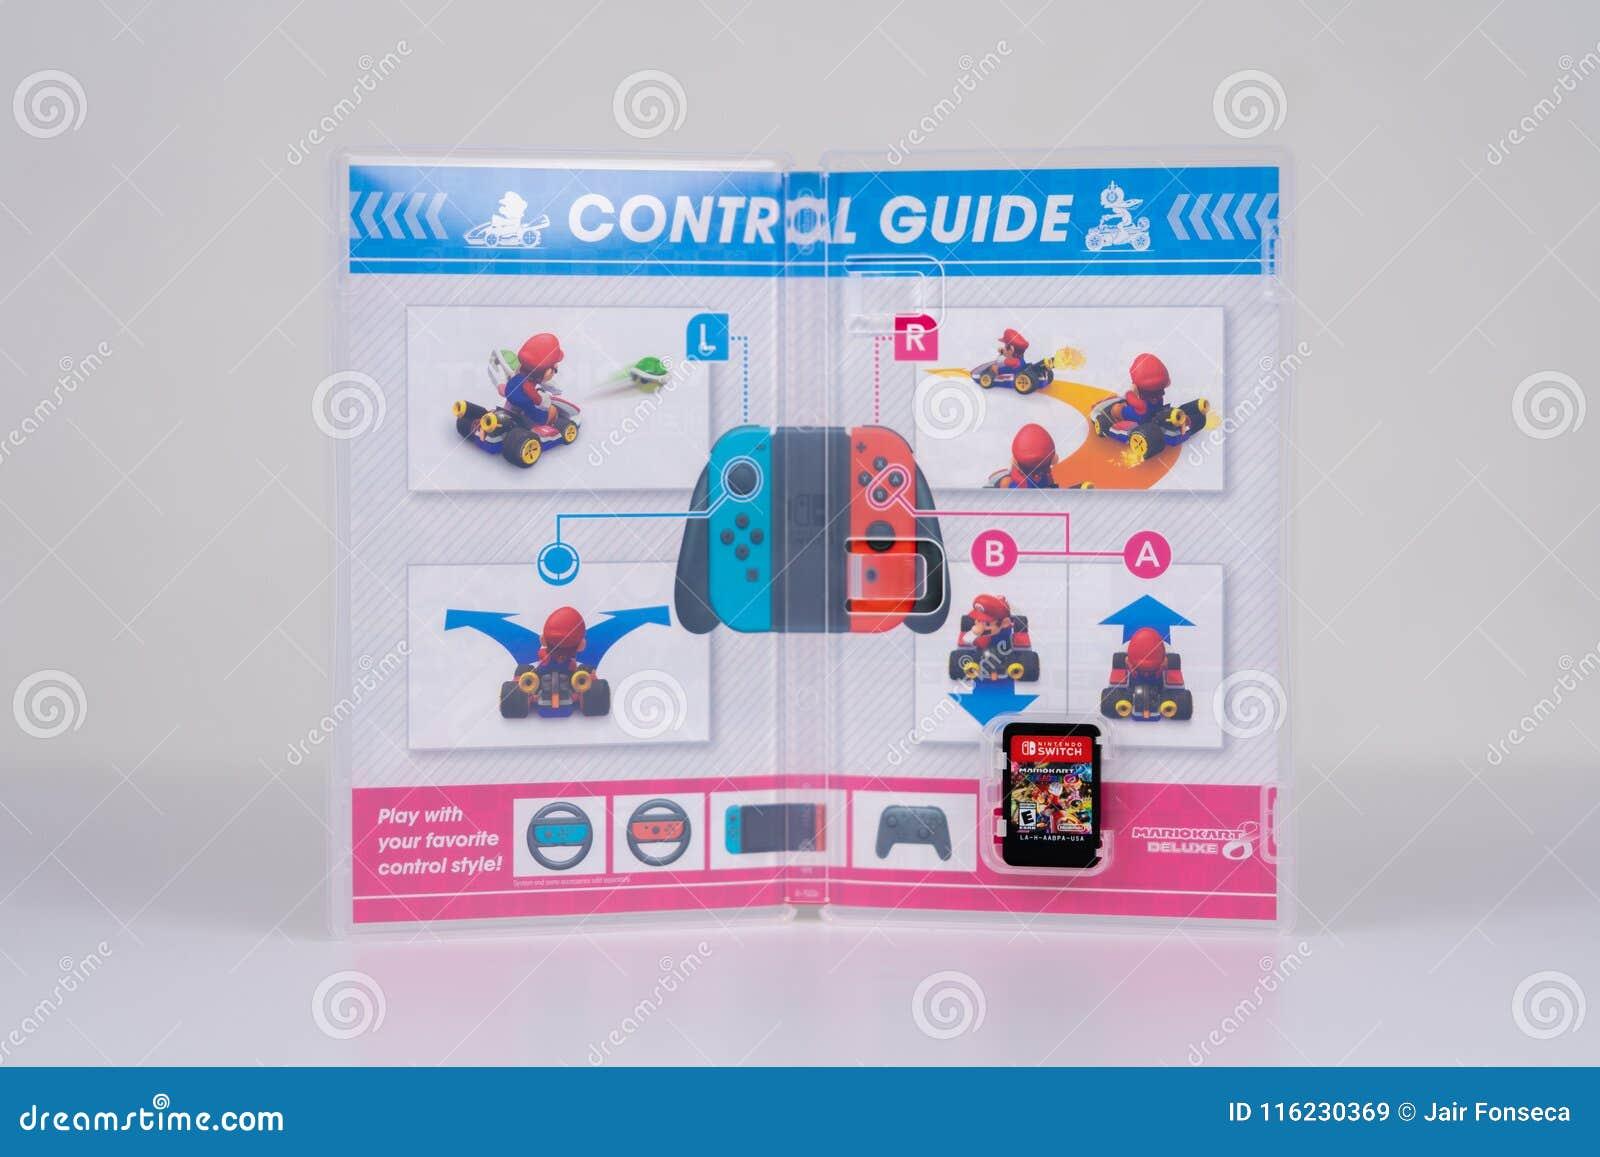 Nintendo Switch Mario Kart Deluxe 8 Editorial Stock Image